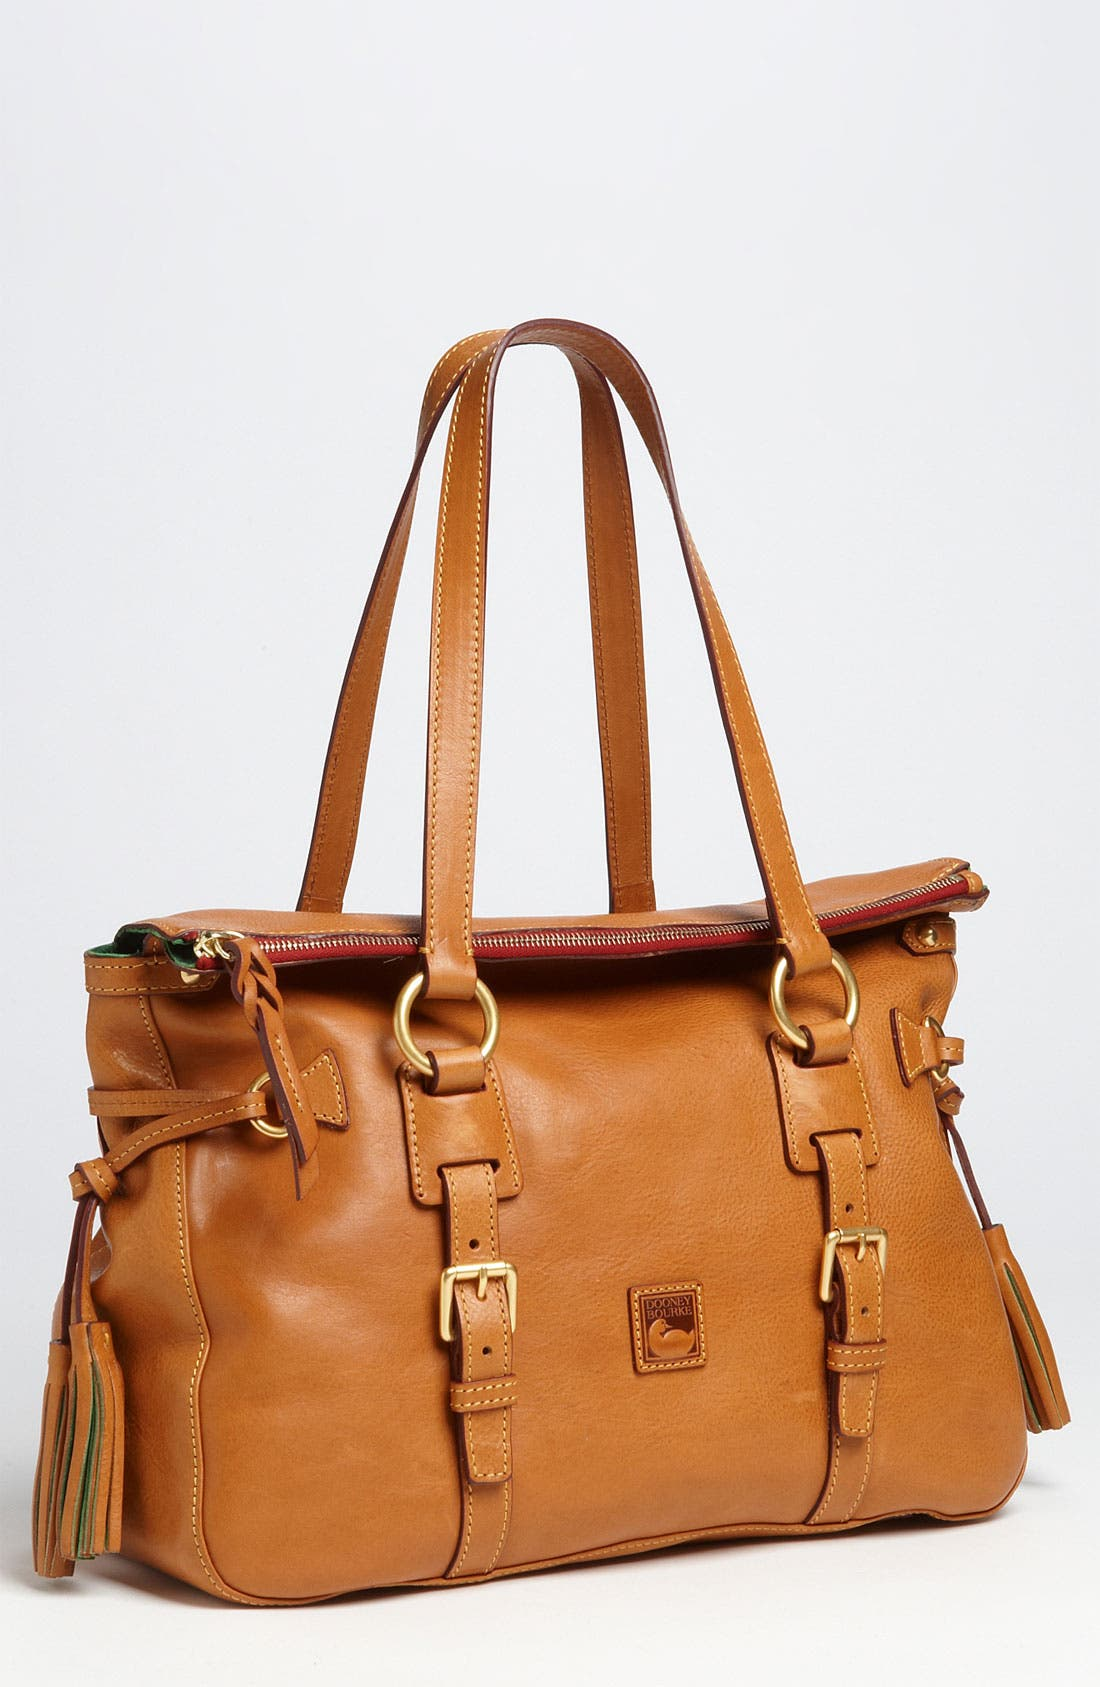 Main Image - Dooney & Bourke 'Florentine' Vachetta Leather Satchel